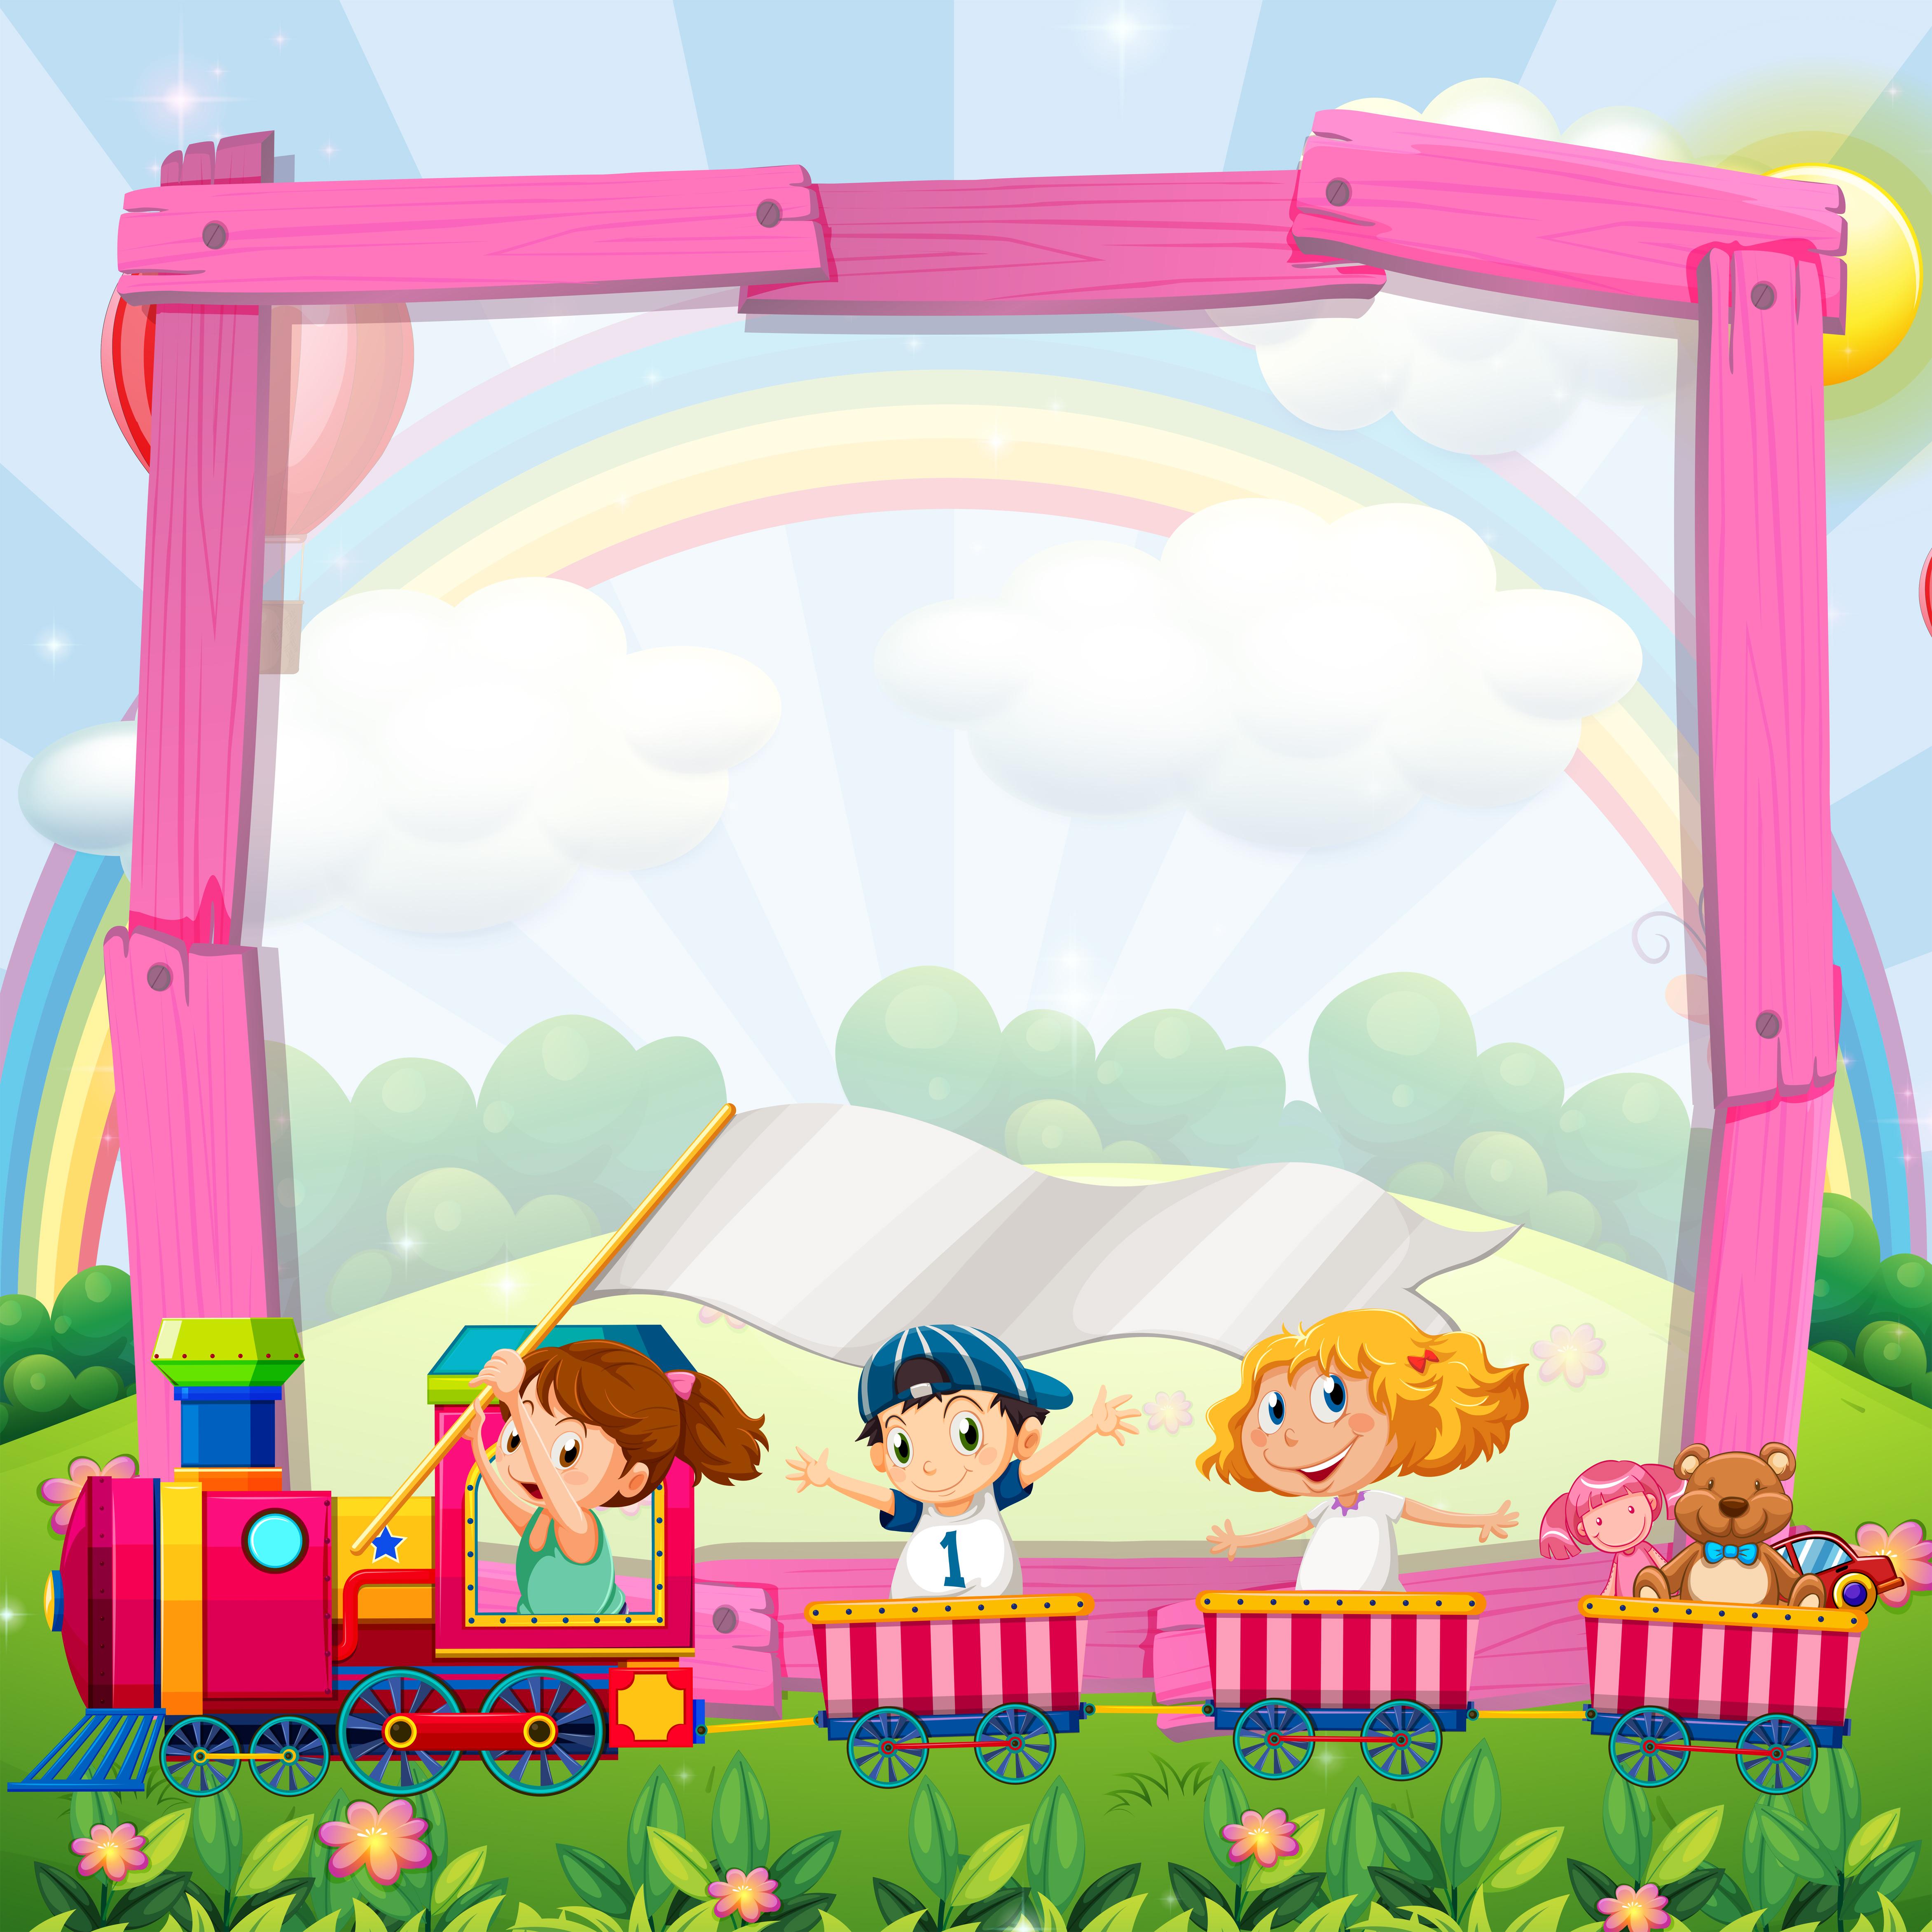 Border Design With Children On The Train Download Free Vectors Clipart Graphics Vector Art